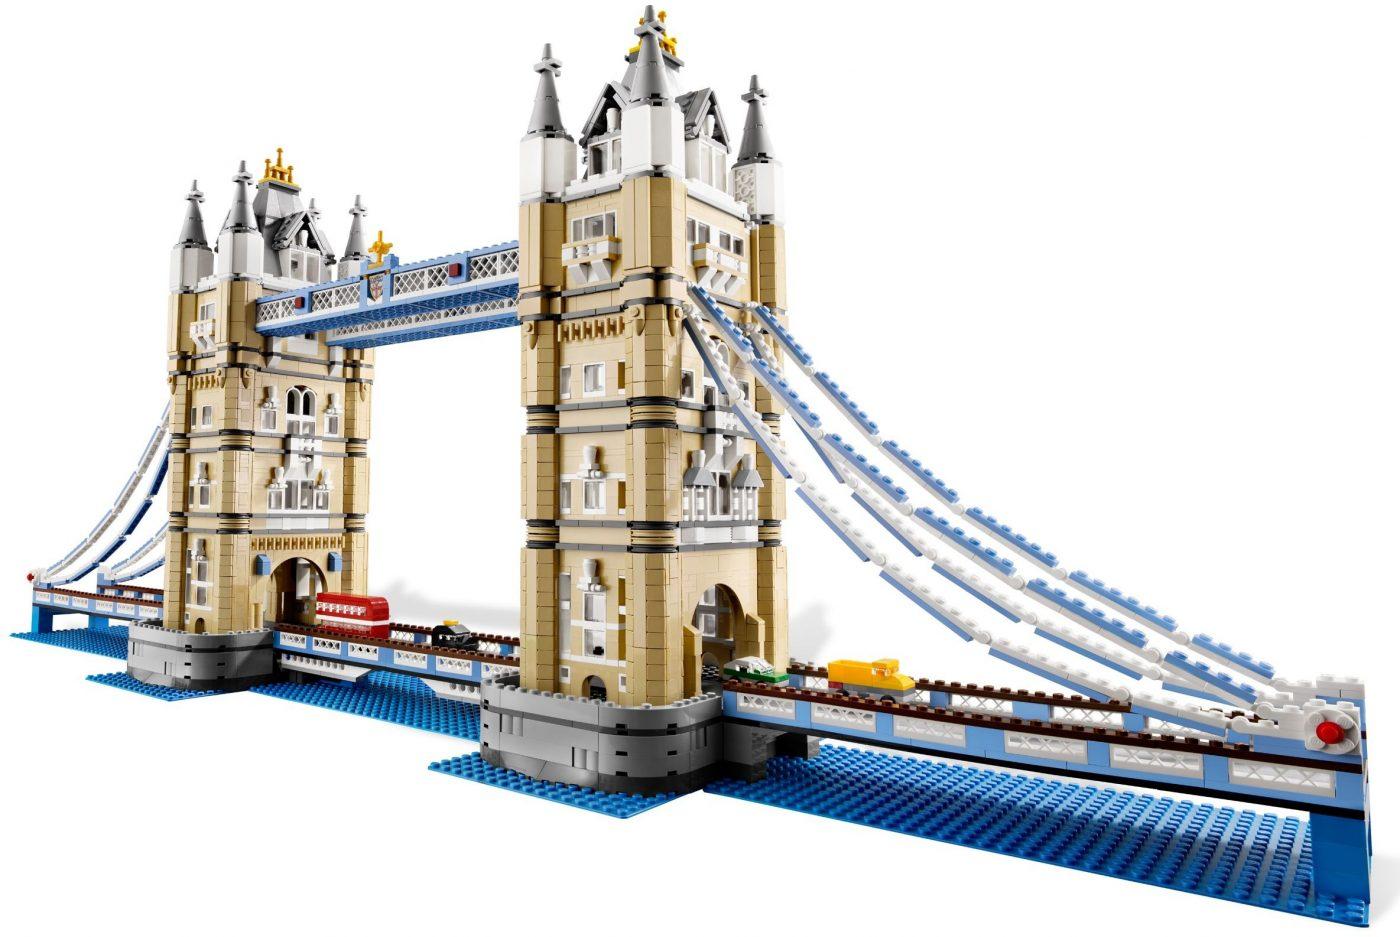 LEGO Creator Expert 10214 Tower Bridge retiring soon